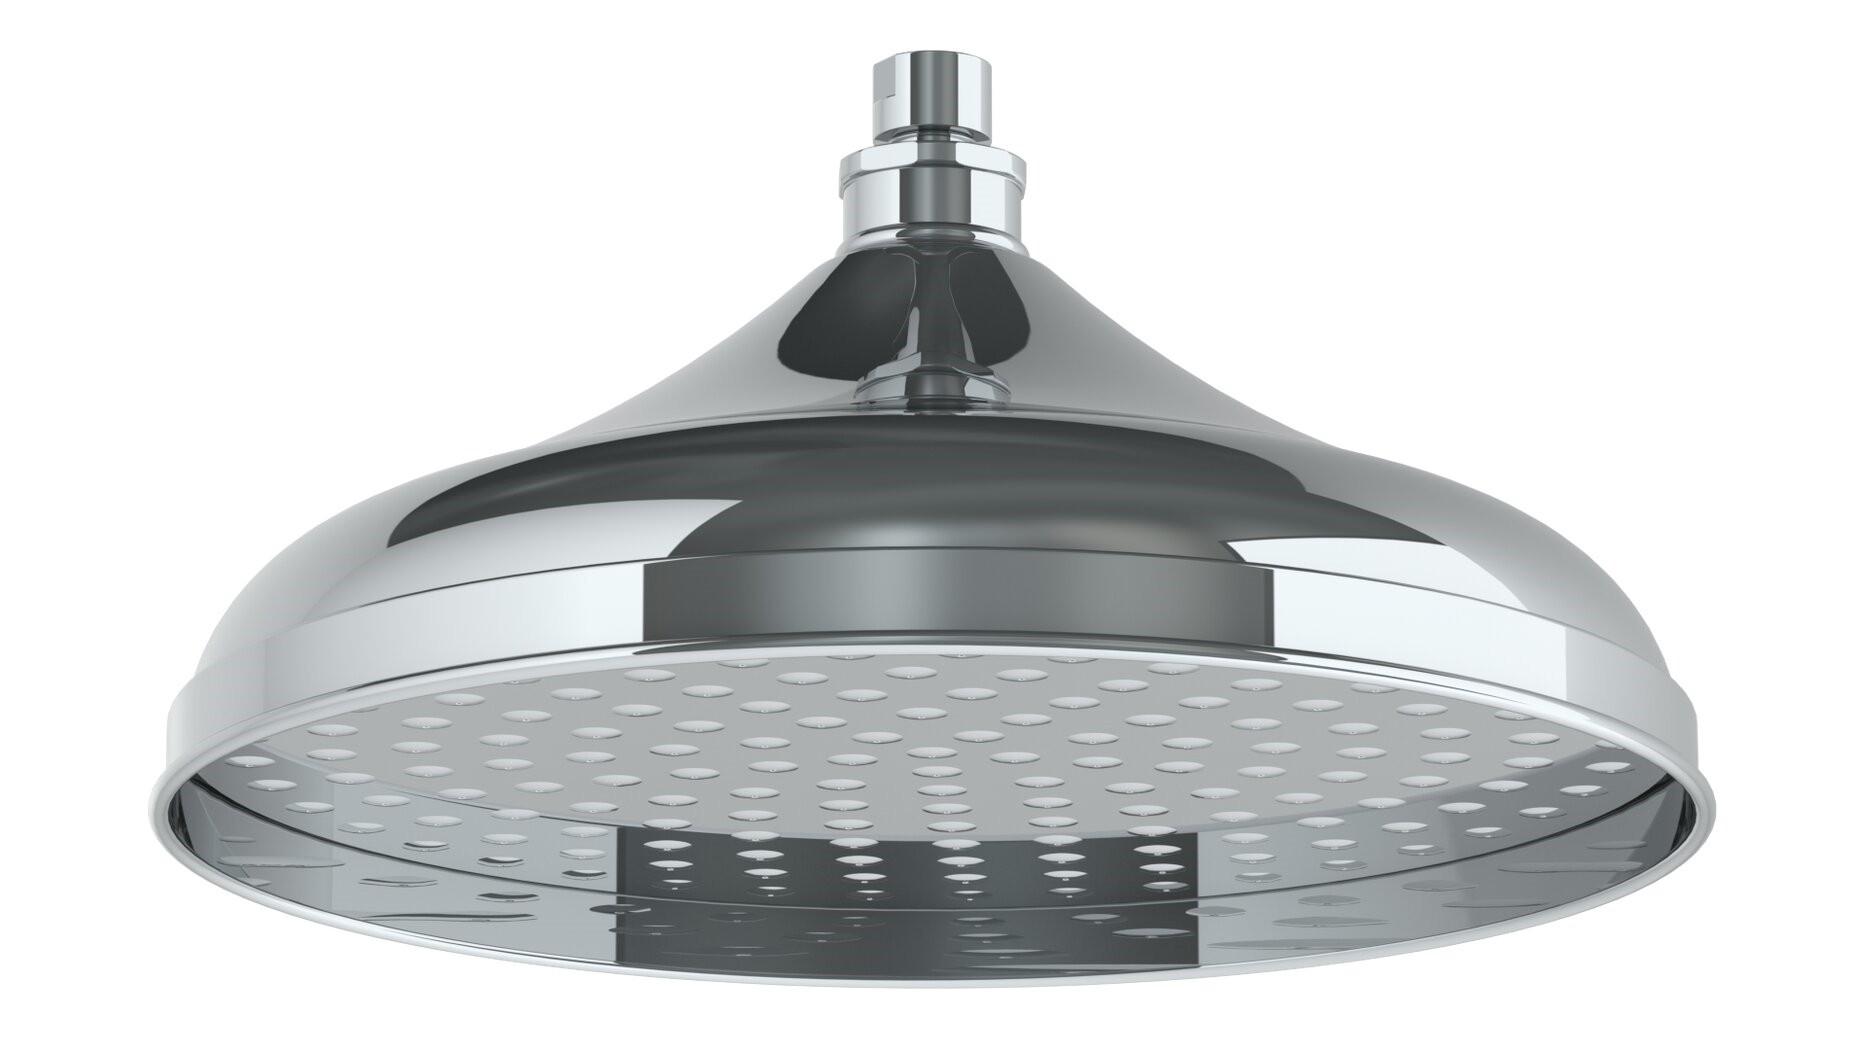 WATERMARK SH-RH080 11 3/4 INCH CEILING MOUNT SINGLE-FUNCTION ROUND SHOWER HEAD